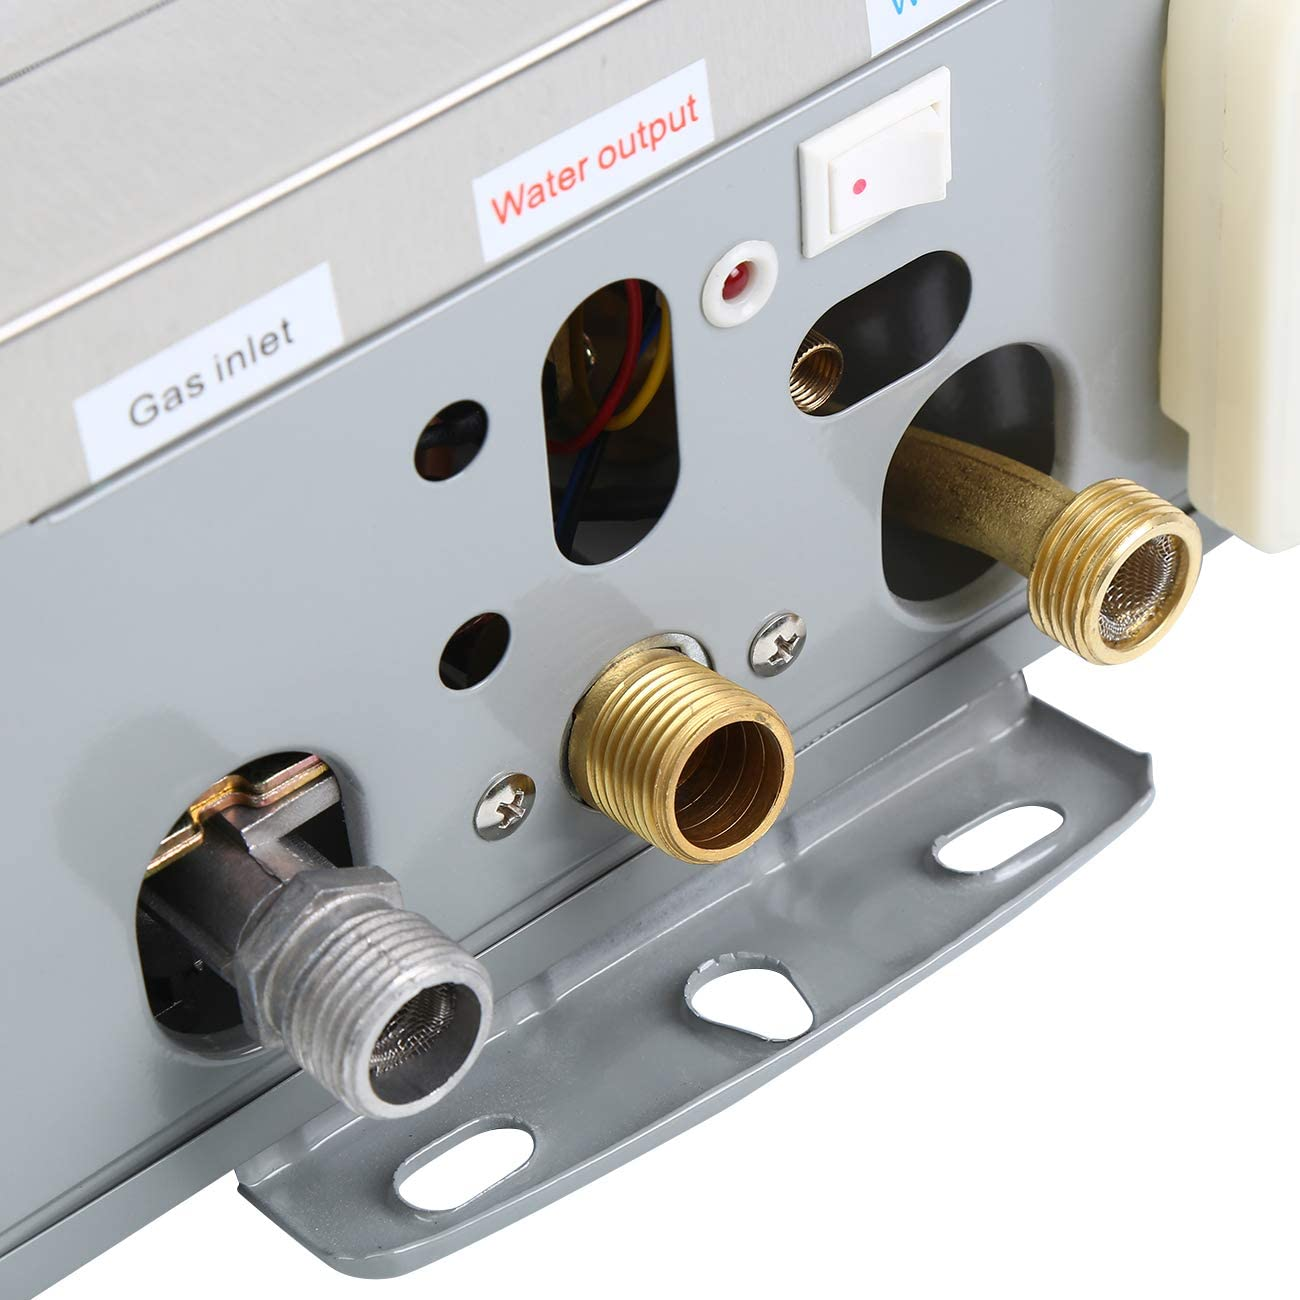 RIDGEYARD 8L//MIN Chauffe-Eau Instantané à Gaz LPG Propane Water Heater Douche